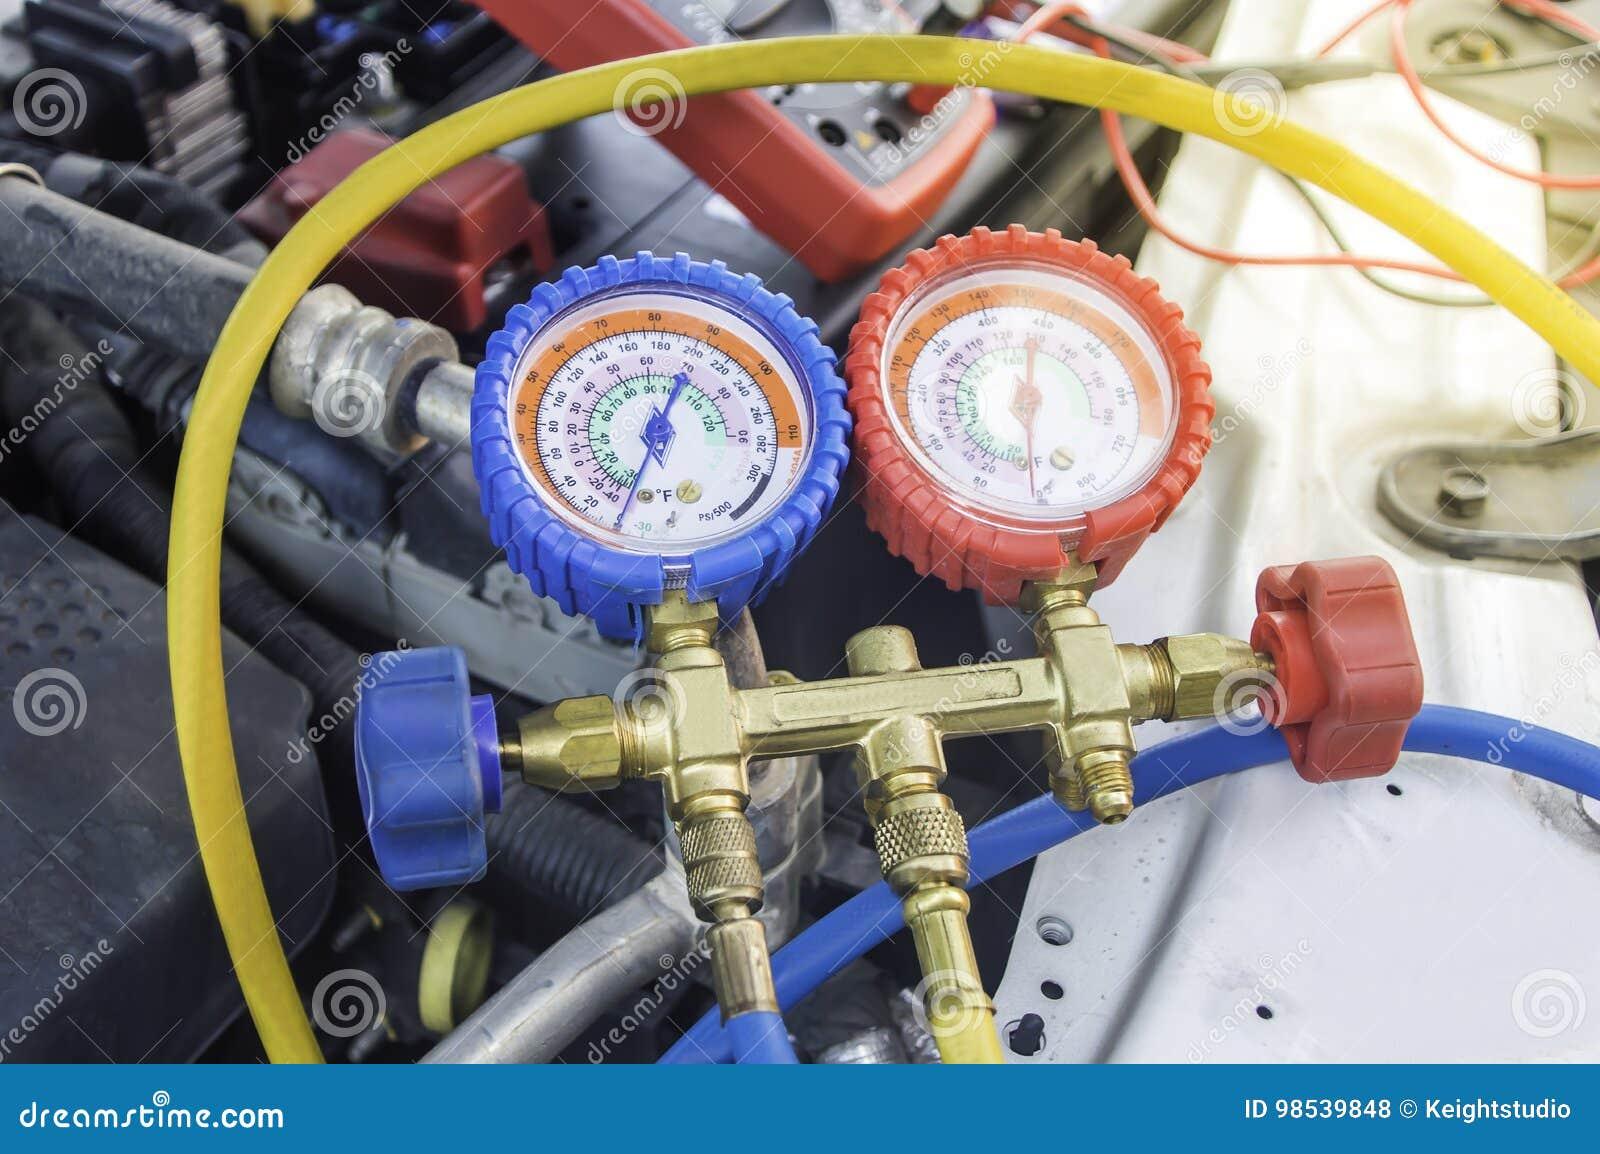 Auto Mechanic Uses A Pressure Gauge On The Air Compressor,liquid ...